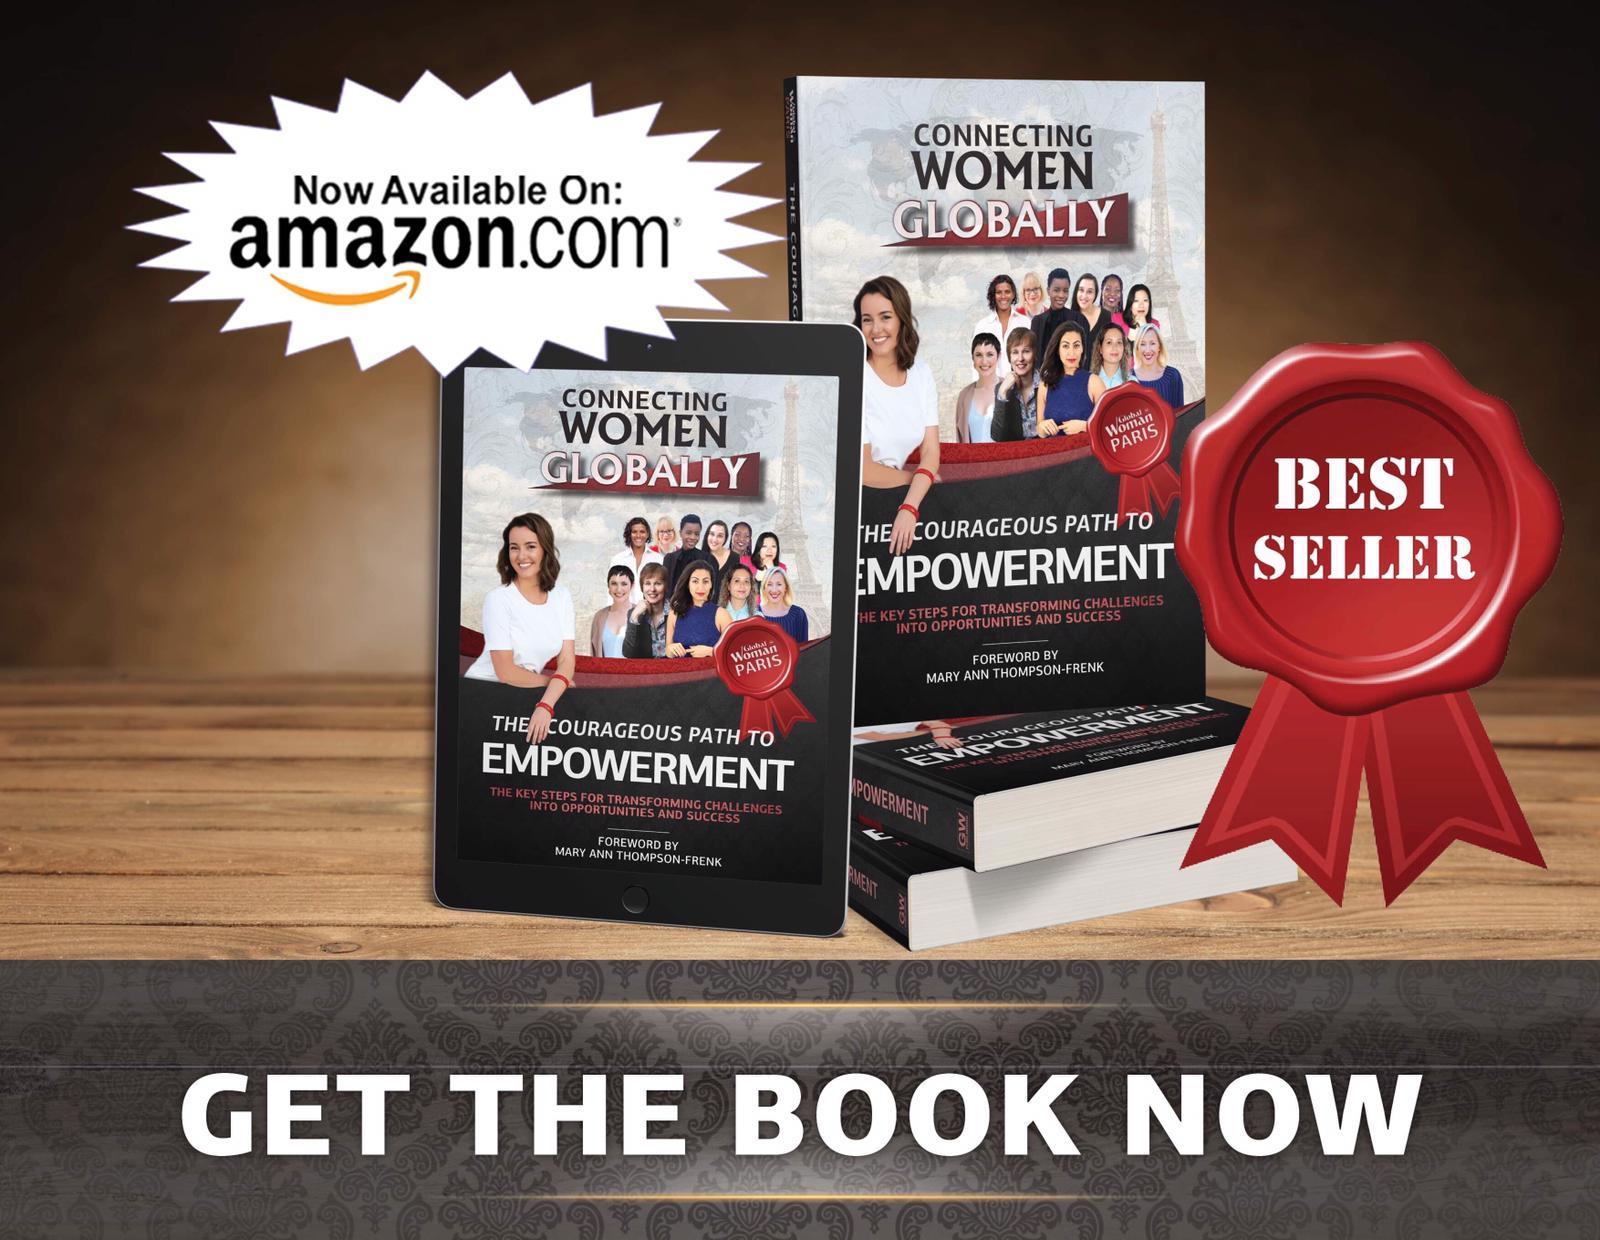 GWC Best Seller